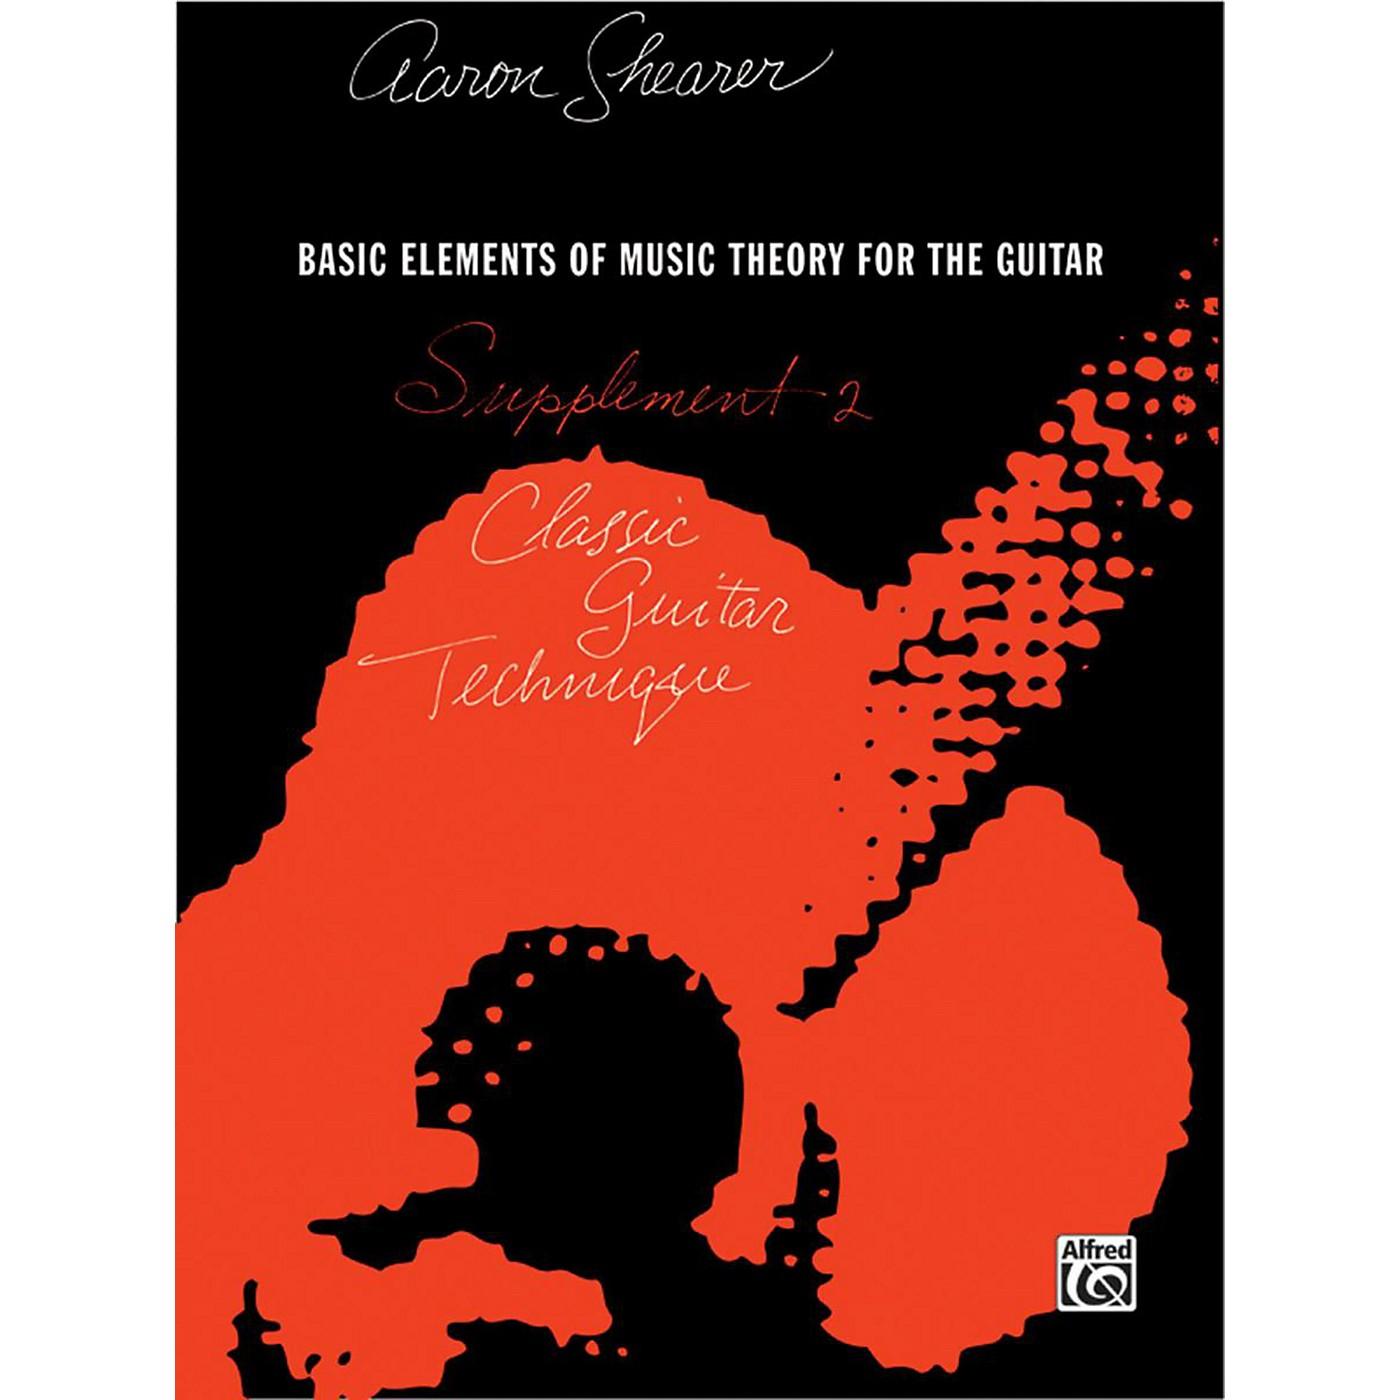 Alfred Classic Guitar Technique Supplement 2 Book thumbnail